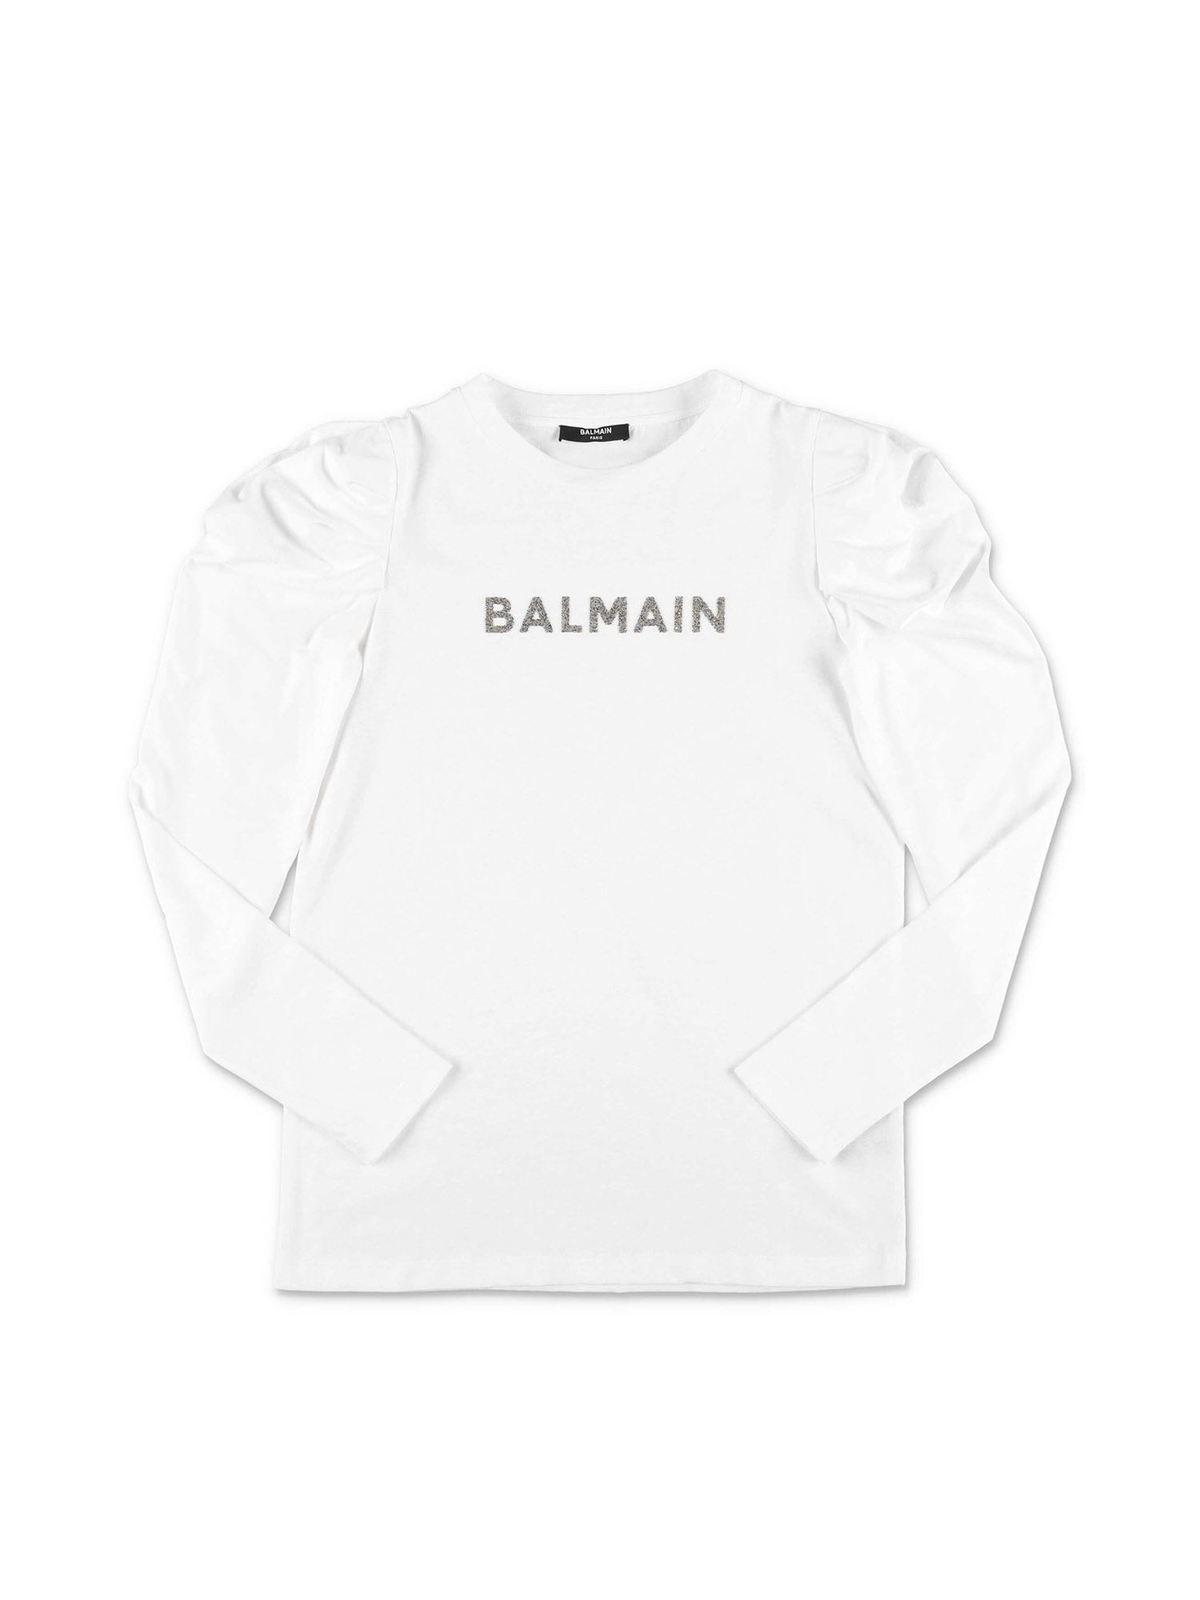 BALMAIN WHITE T-SHIRT WITH CRYSTAL PRINT